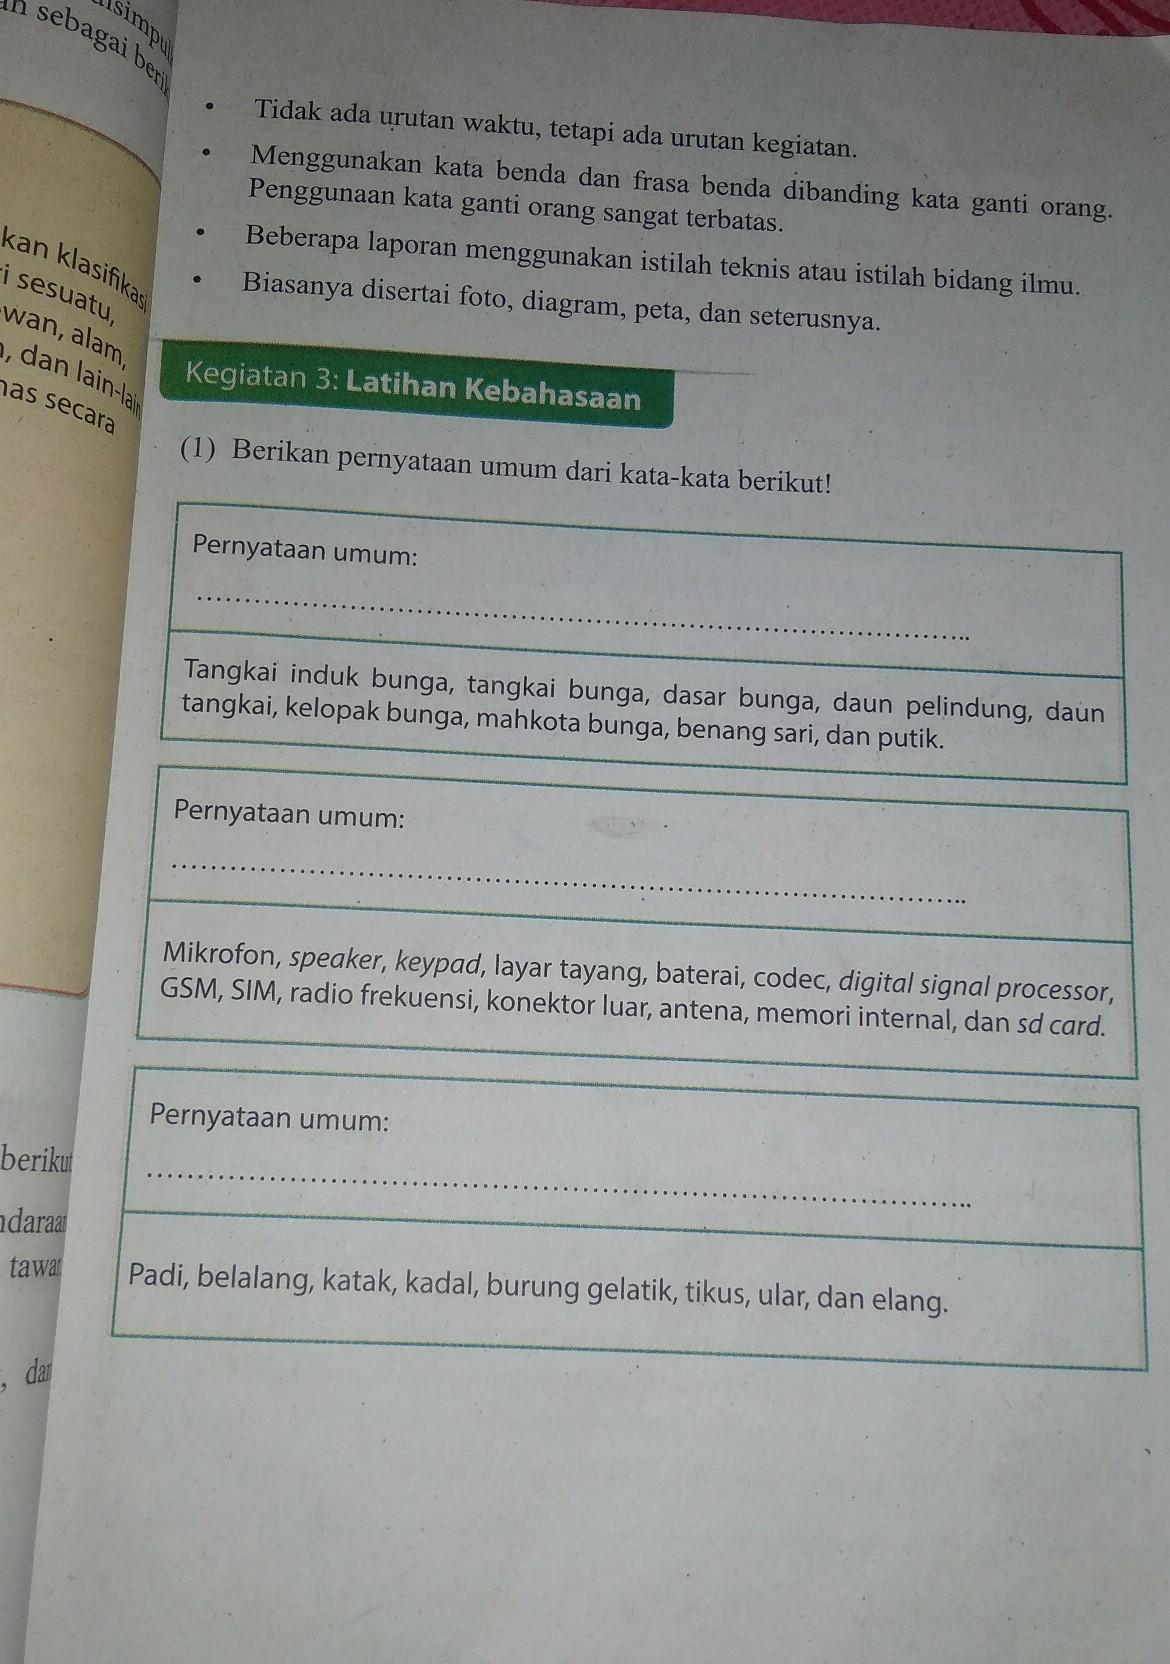 Jawaban Tugas Bahasa Indonesia Kelas 9 Halaman 25 Brainly Co Id